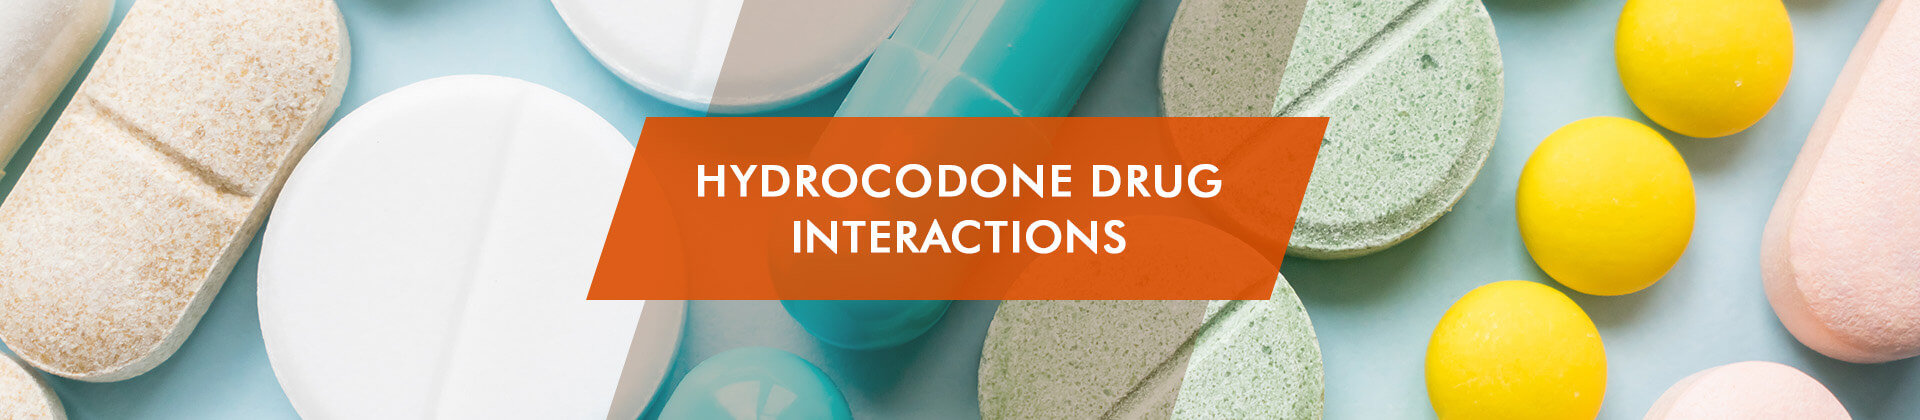 hydrocodone drug interactions